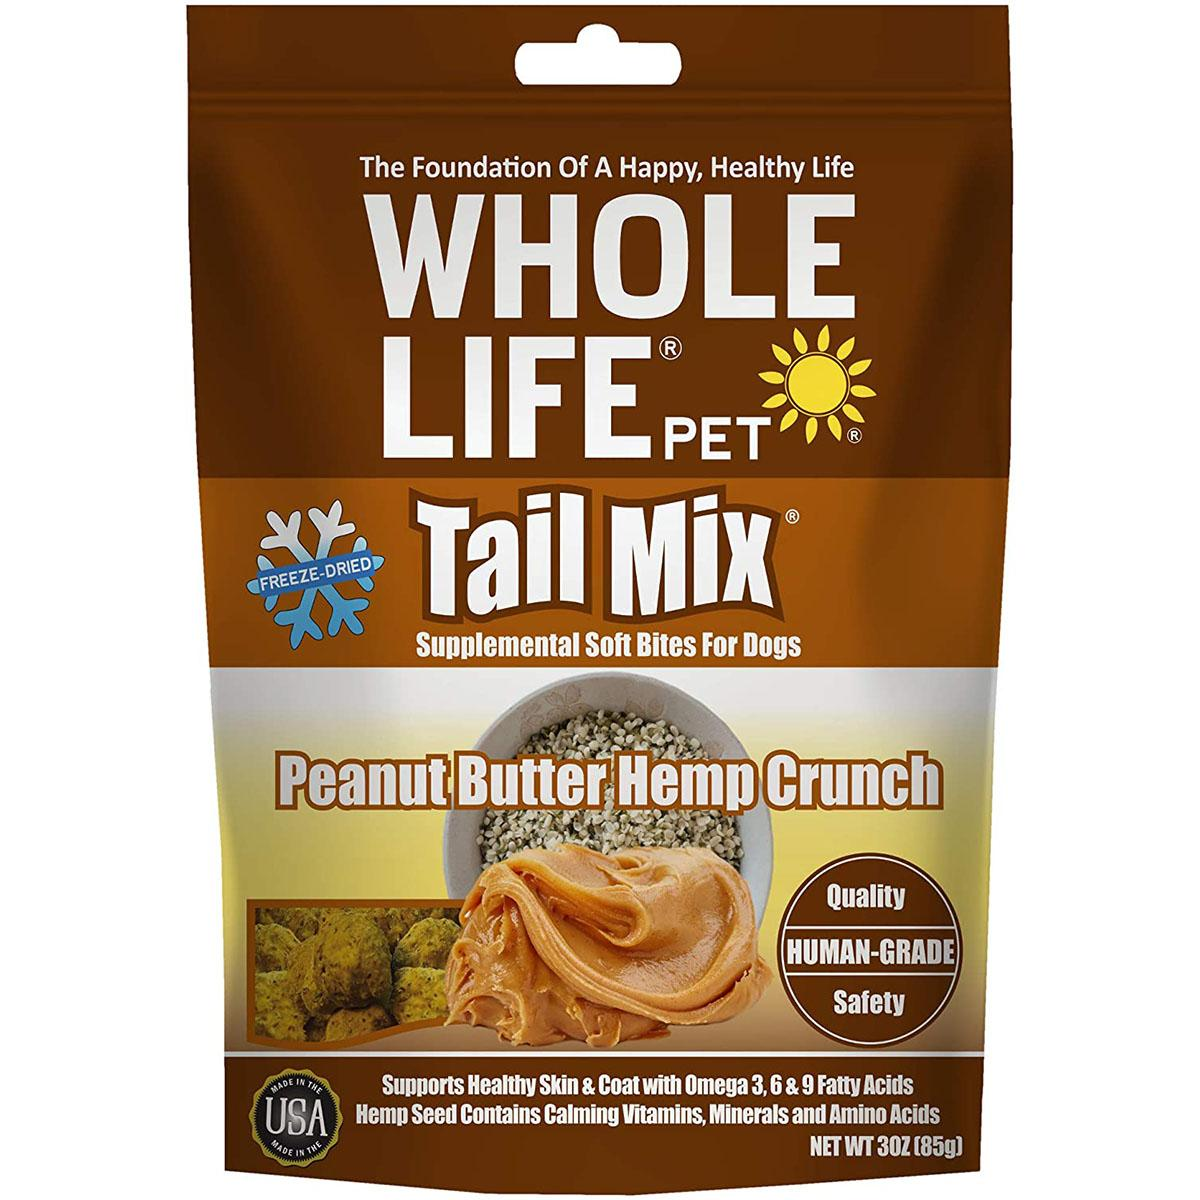 Whole Life Pet Tail Mix Freeze-Dried Peanut Butter Hemp Crunch Dog Treats